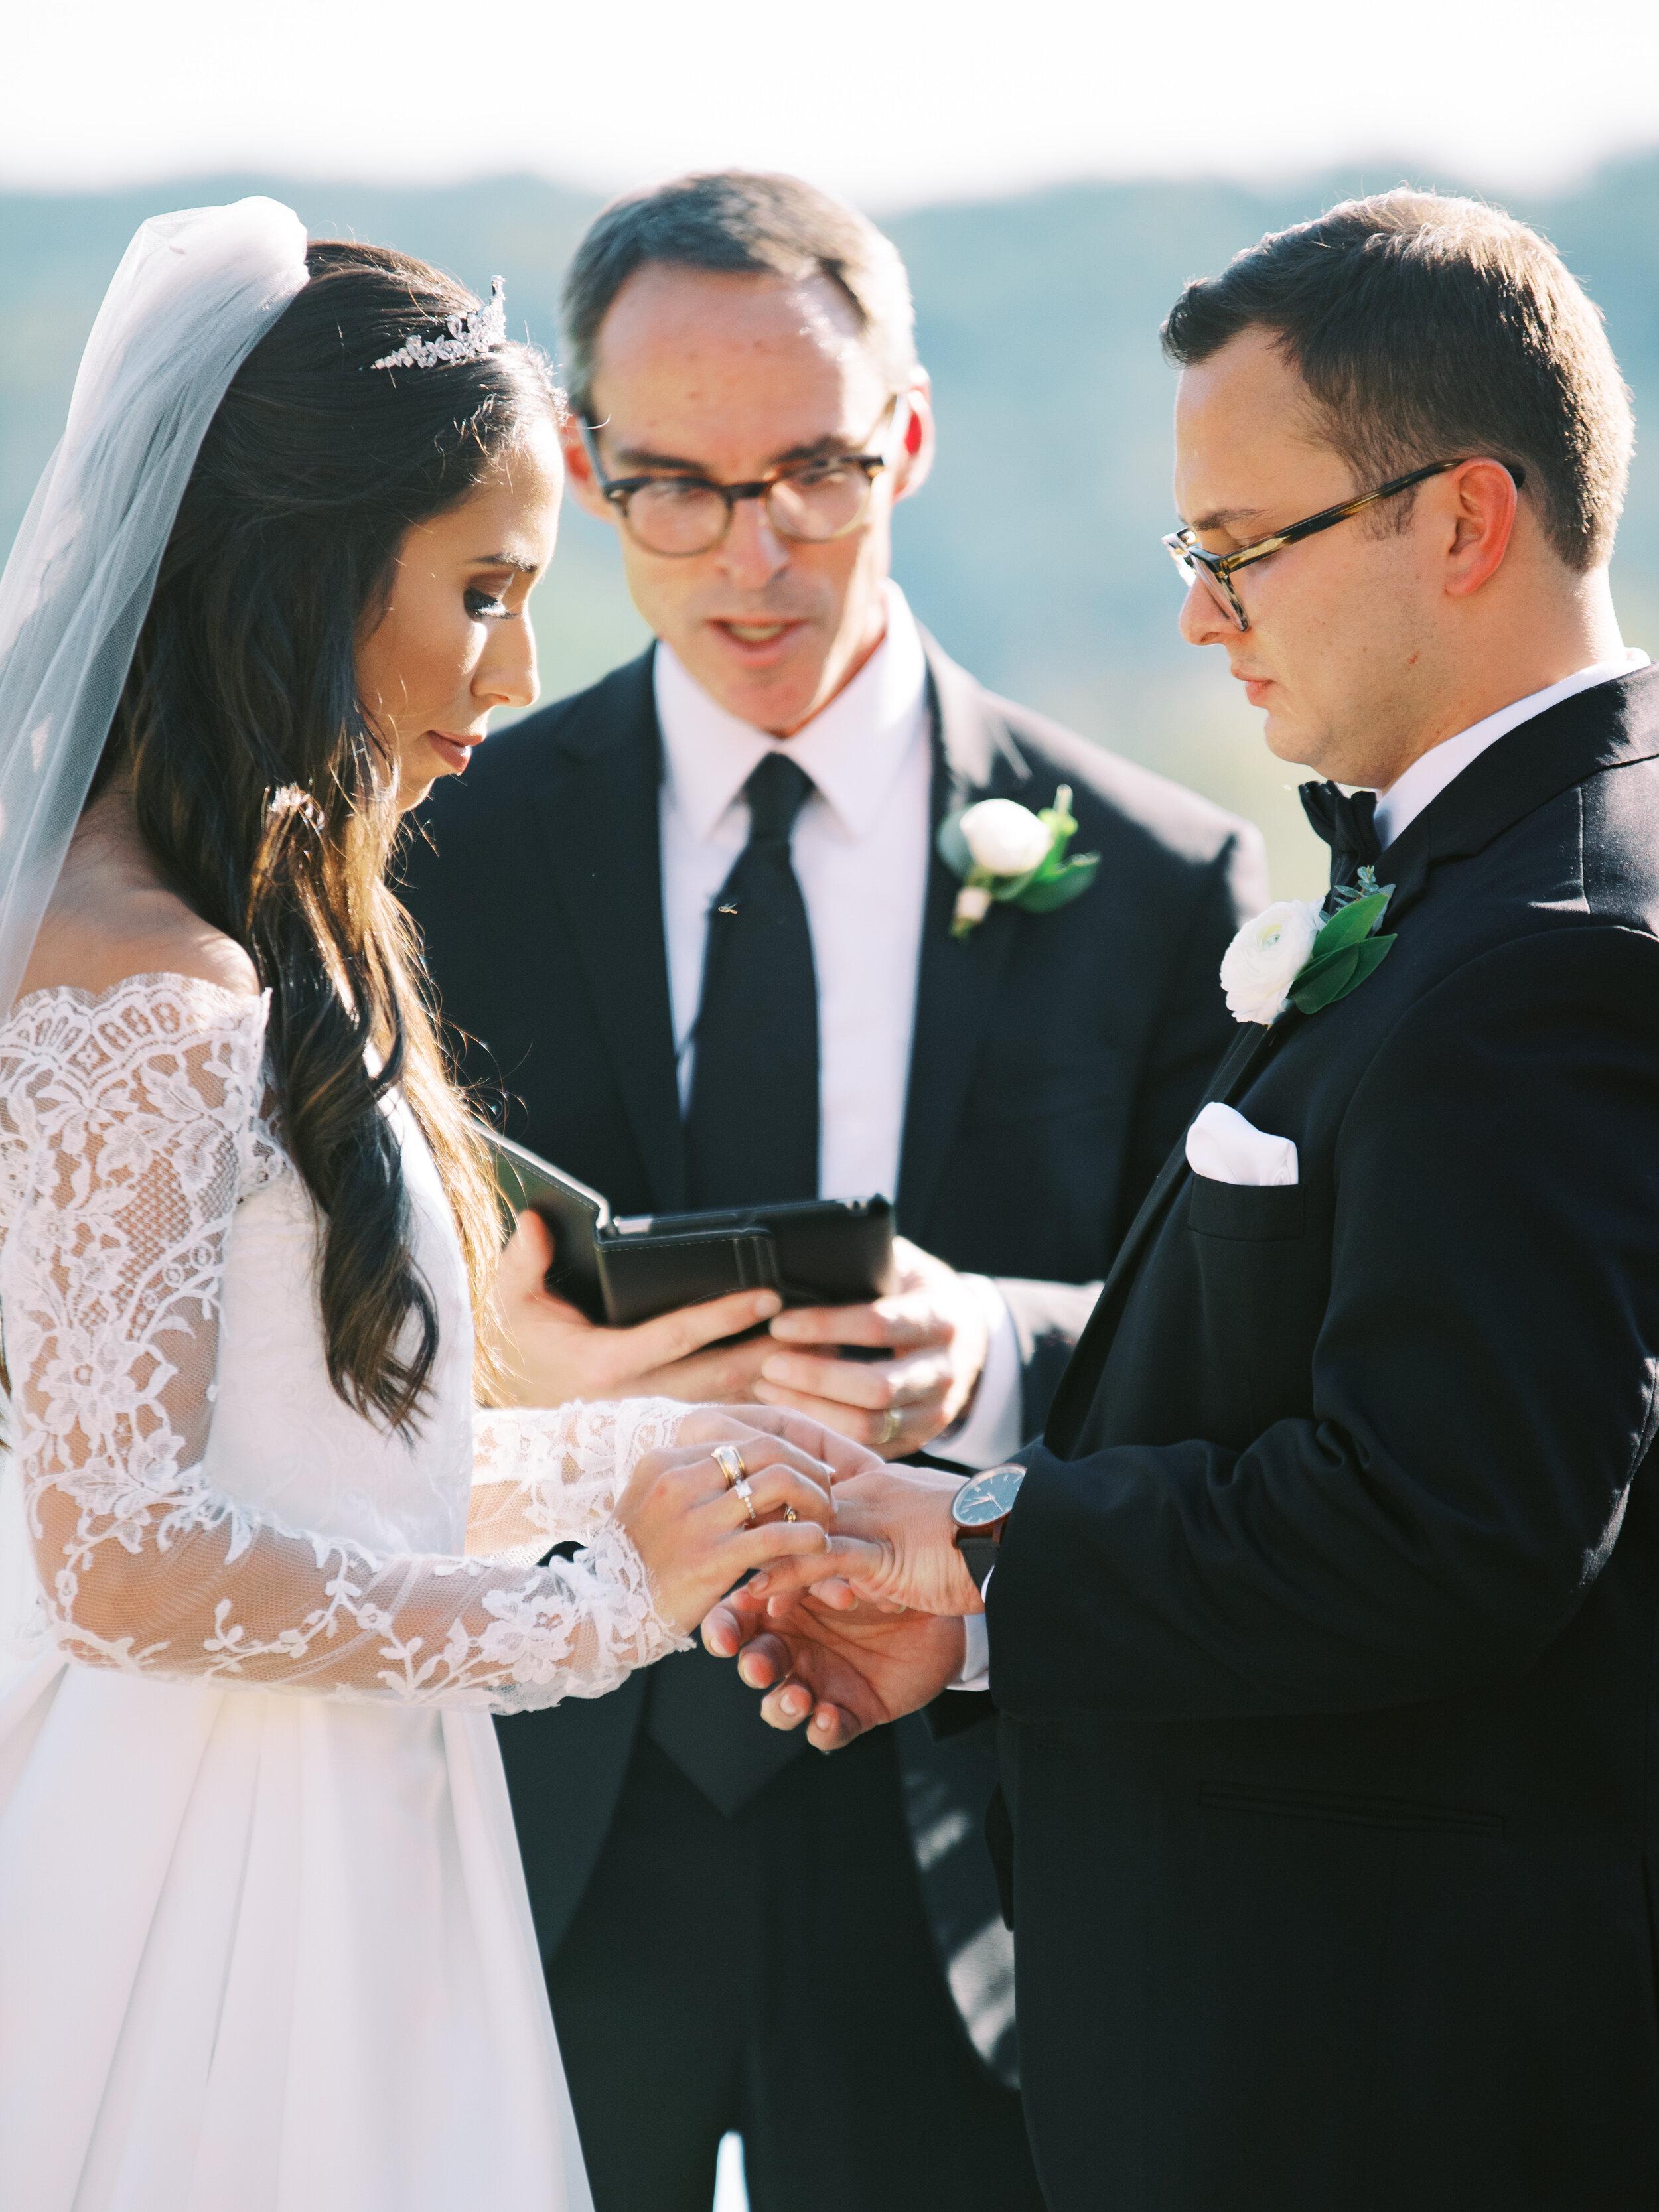 montaluce-winery-wedding-photography-dahlonega-hannah-forsberg-atlanta-film-wedding-photographer16.JPG